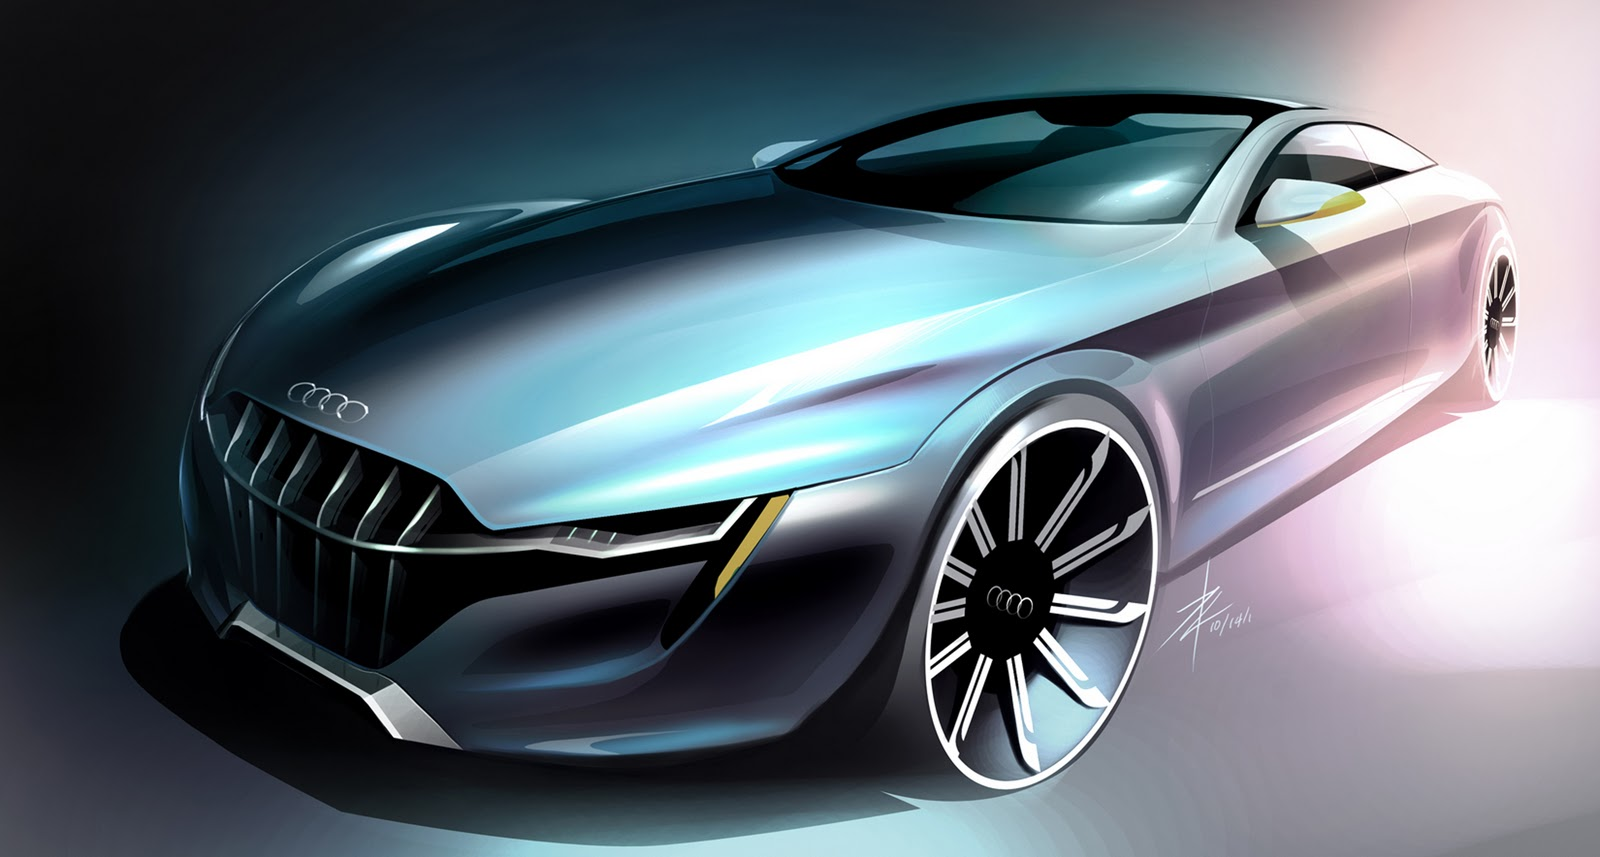 Dsng's Sci Fi Megaverse Futuristic Audi Concept Car Designs